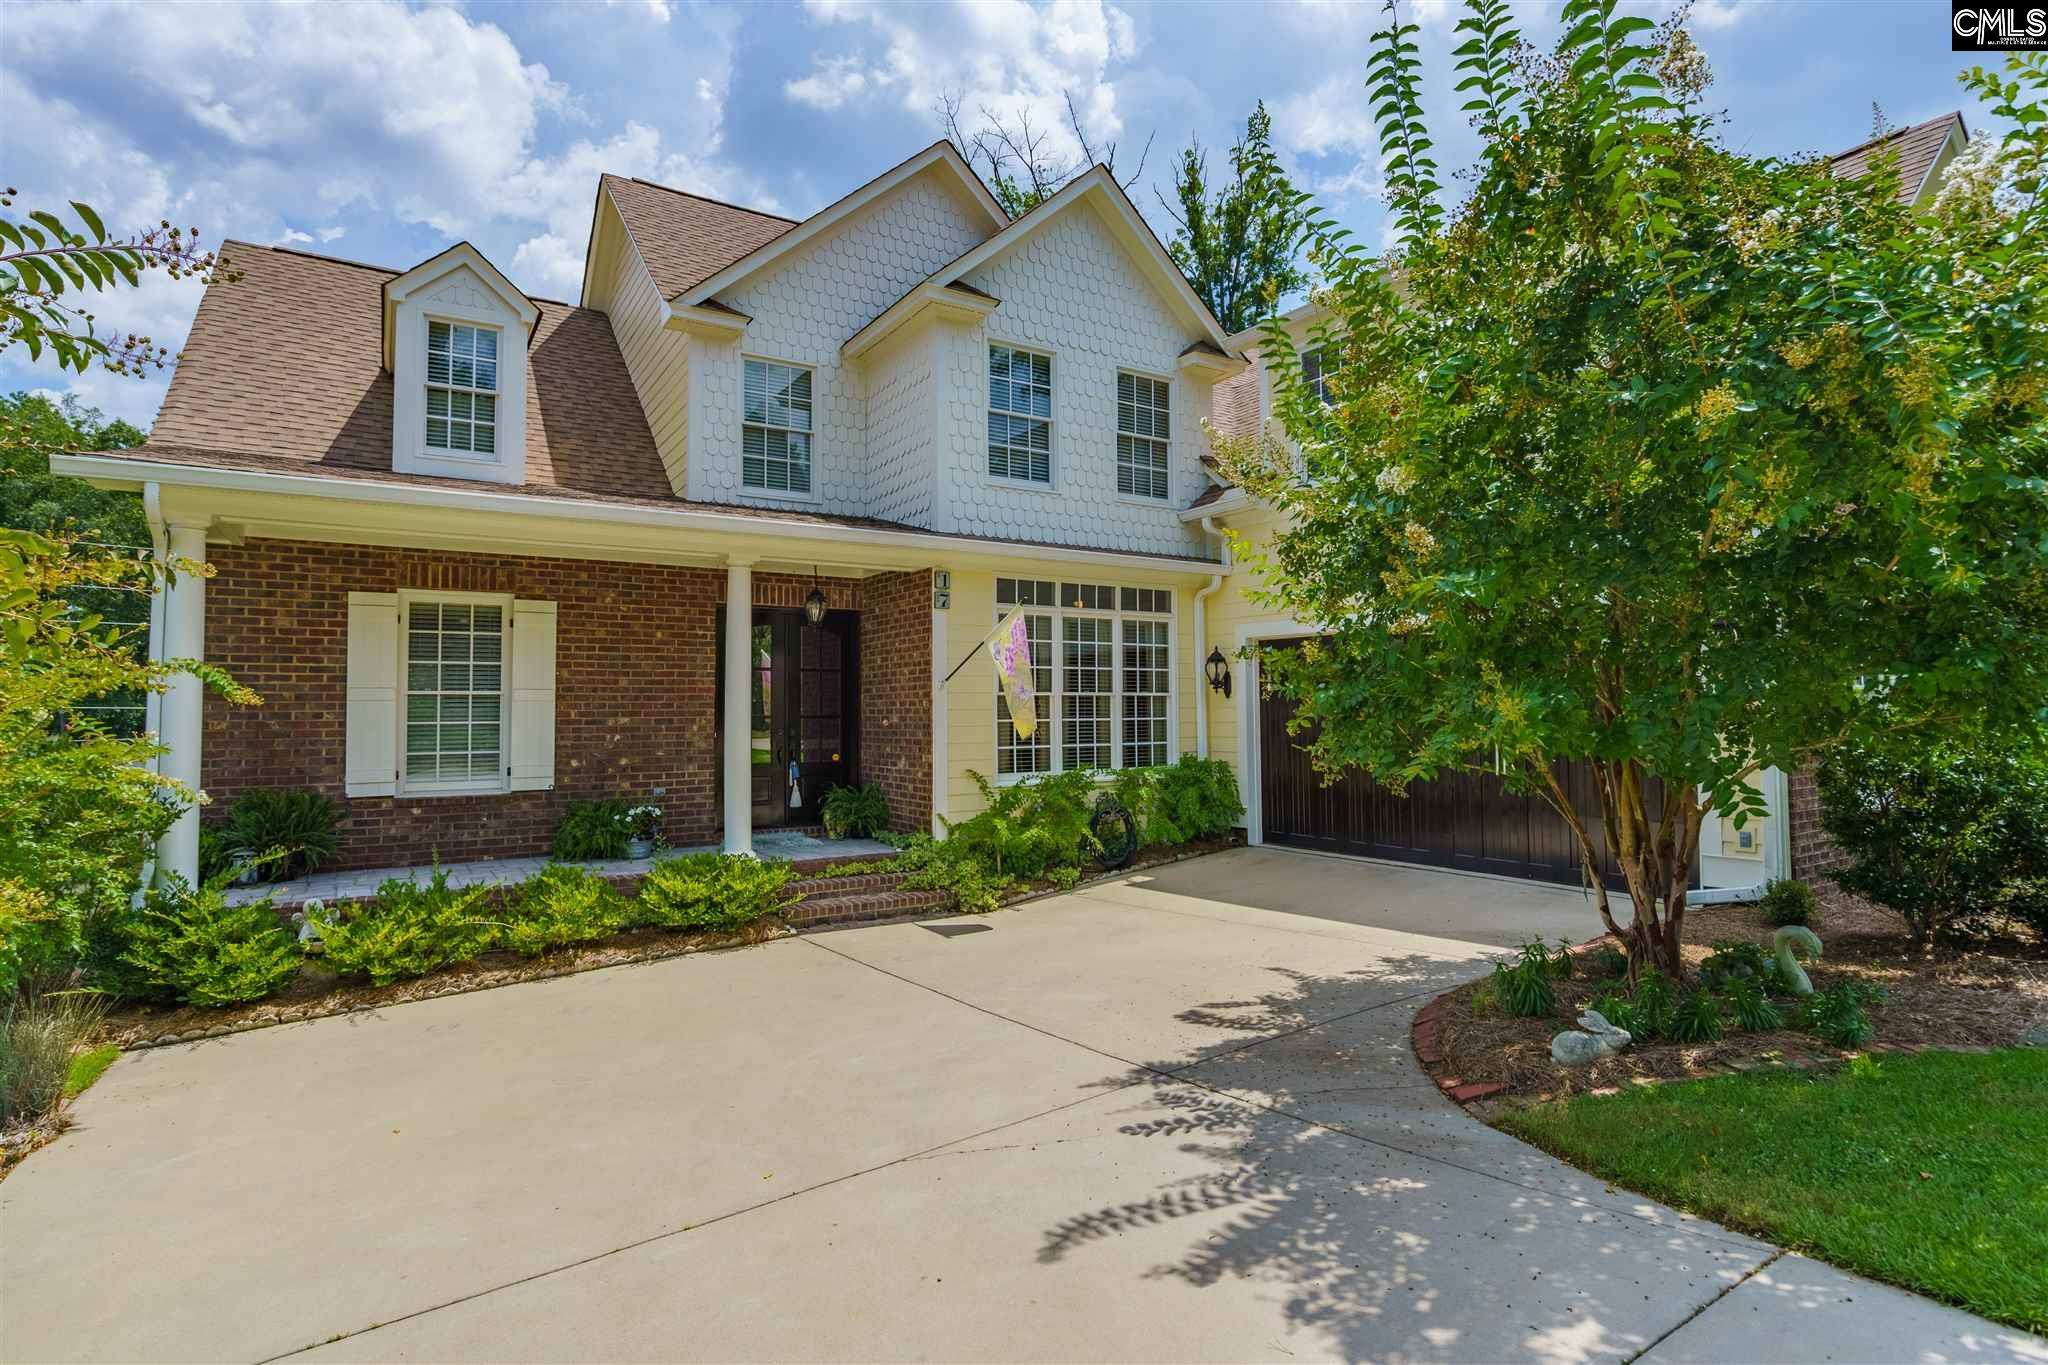 17 Creek Manor Columbia, SC 29206-1485